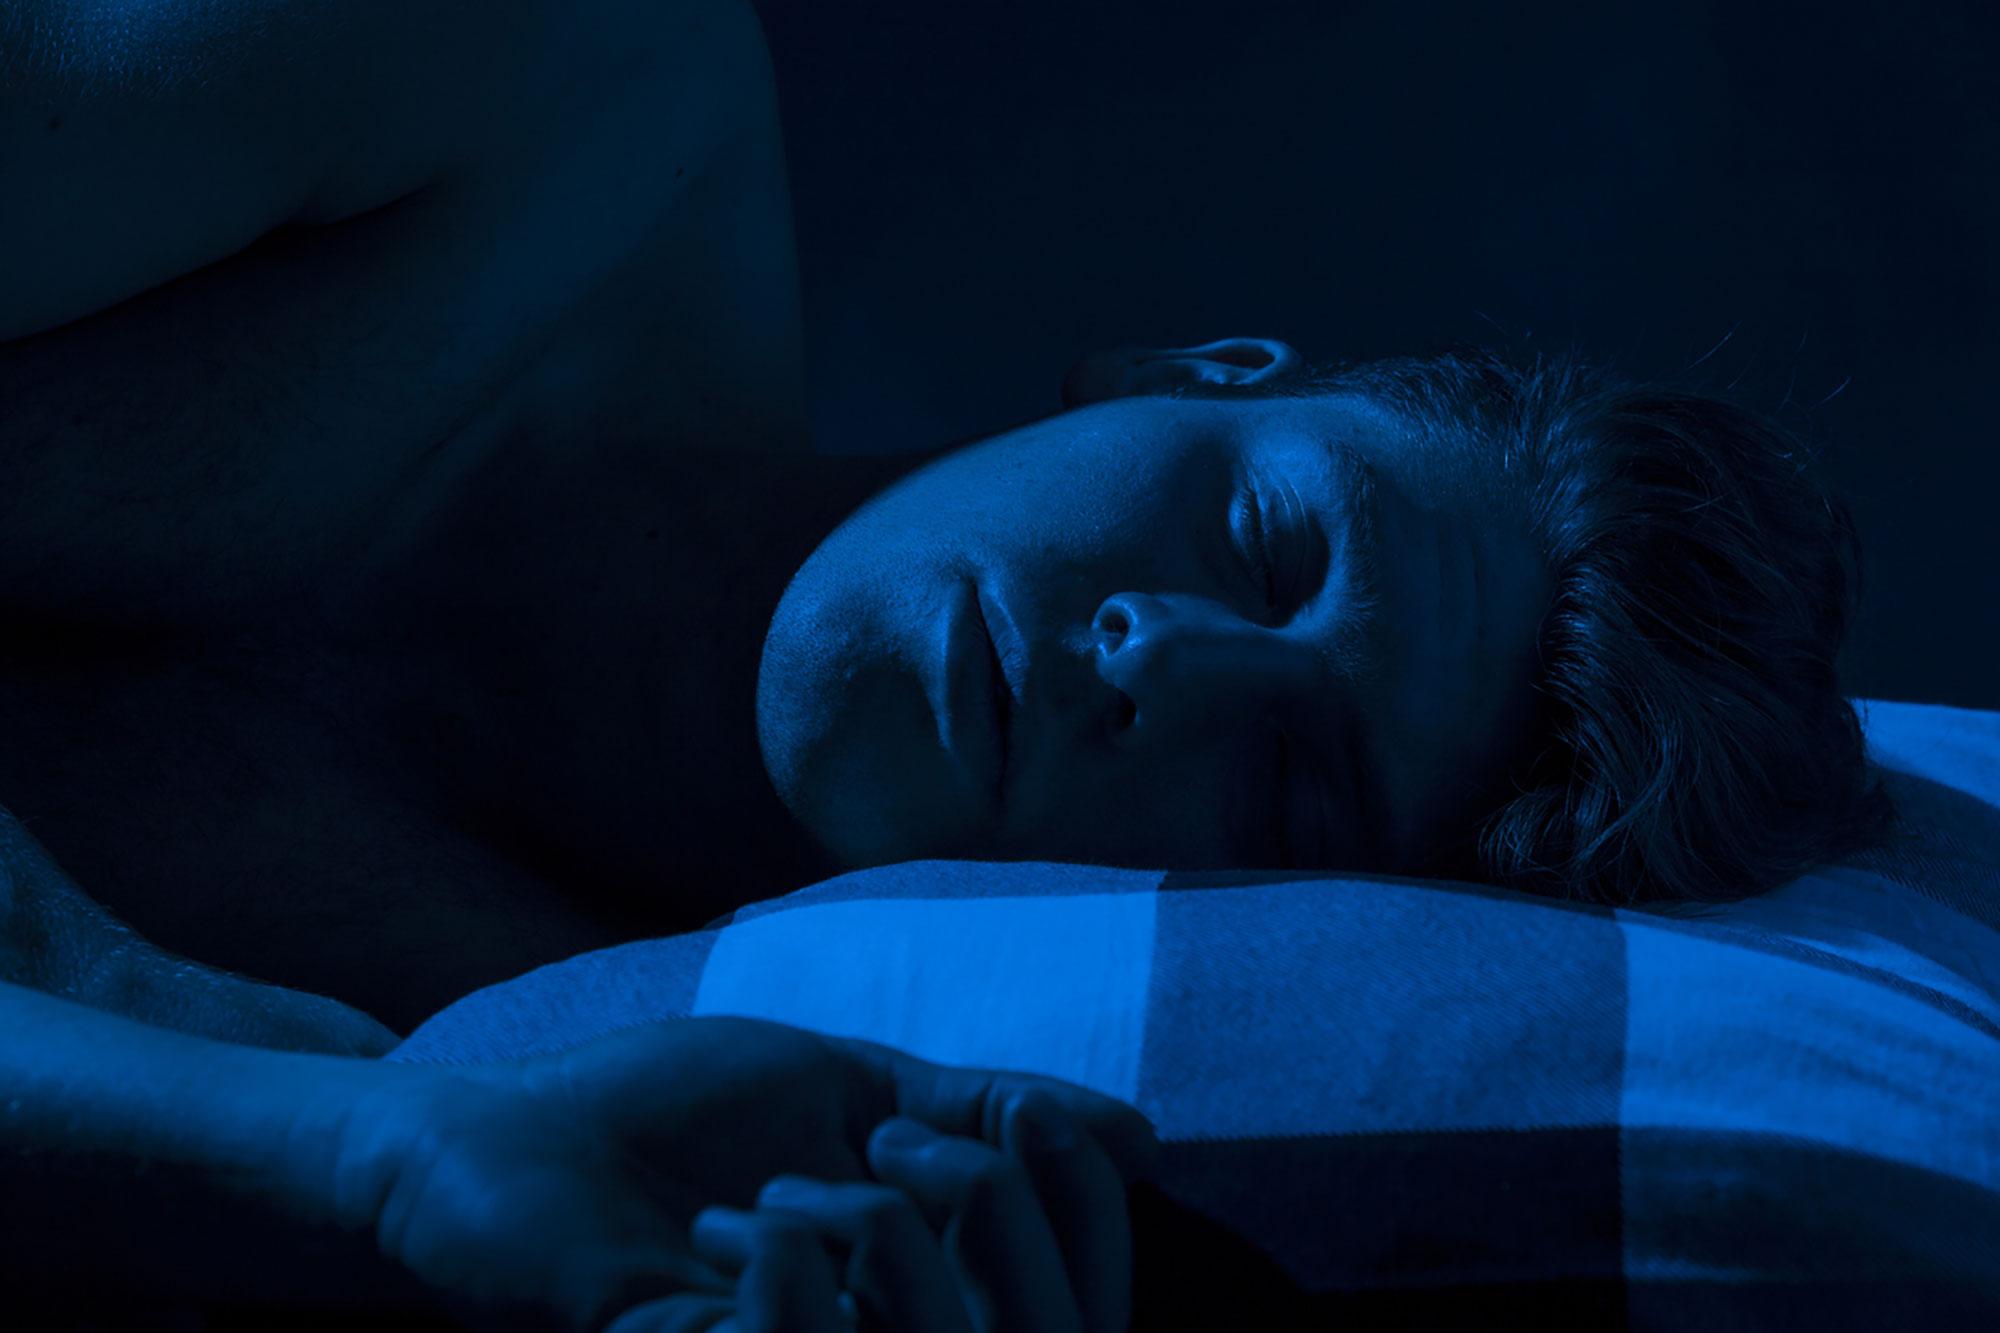 Спим в темноте